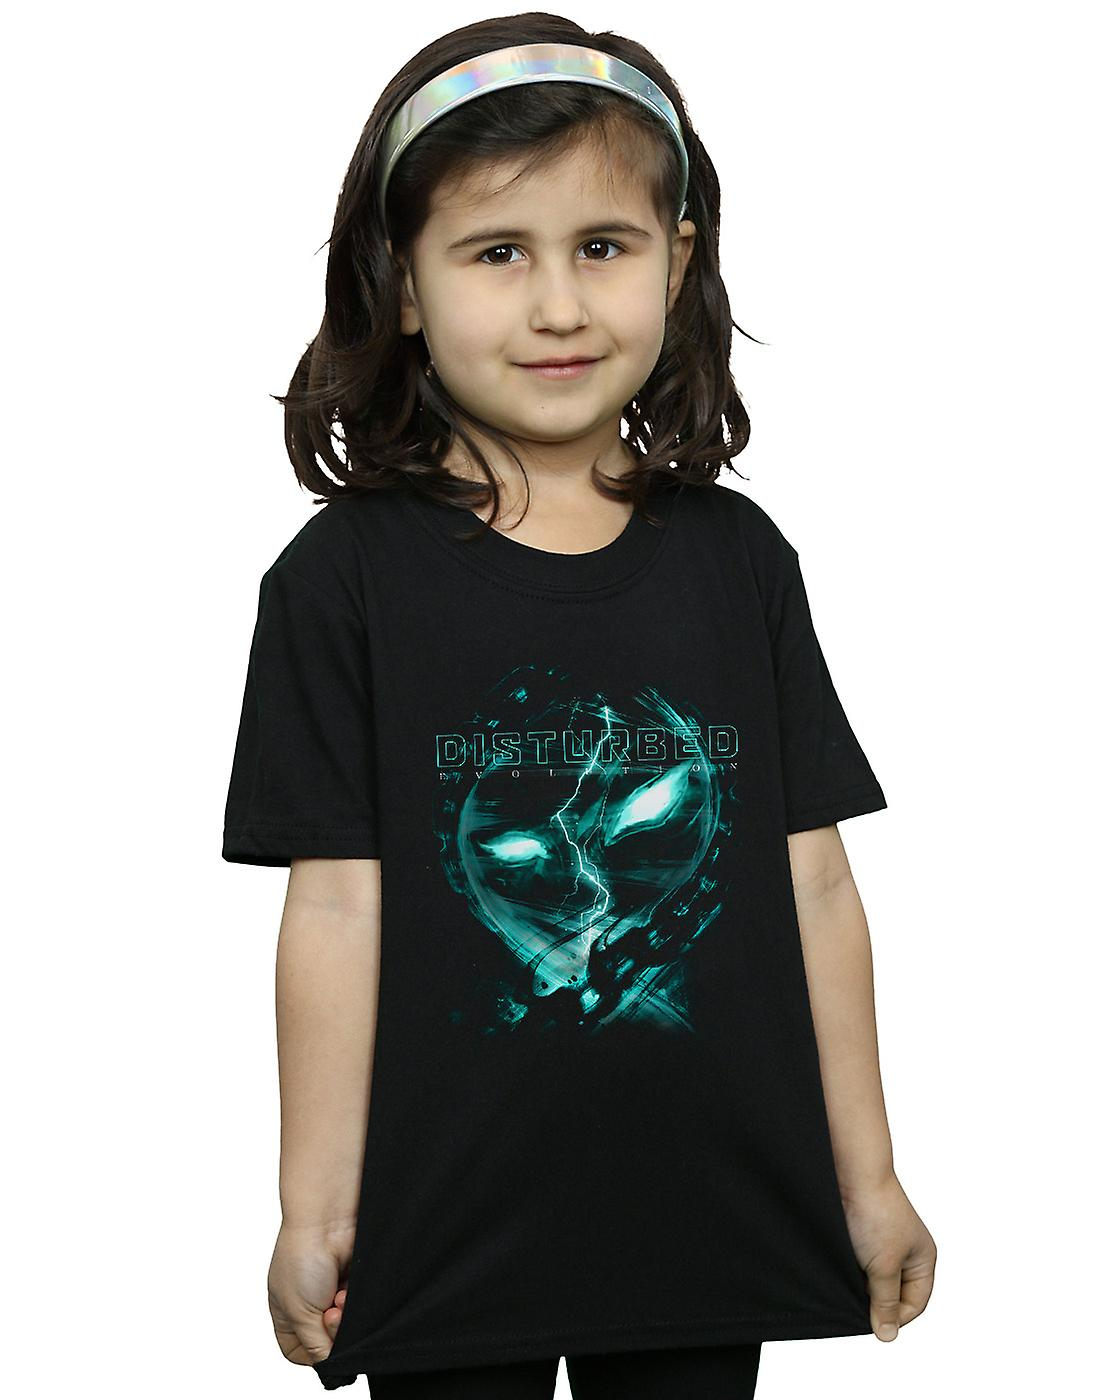 Disturbed Girls Between The Links T-Shirt